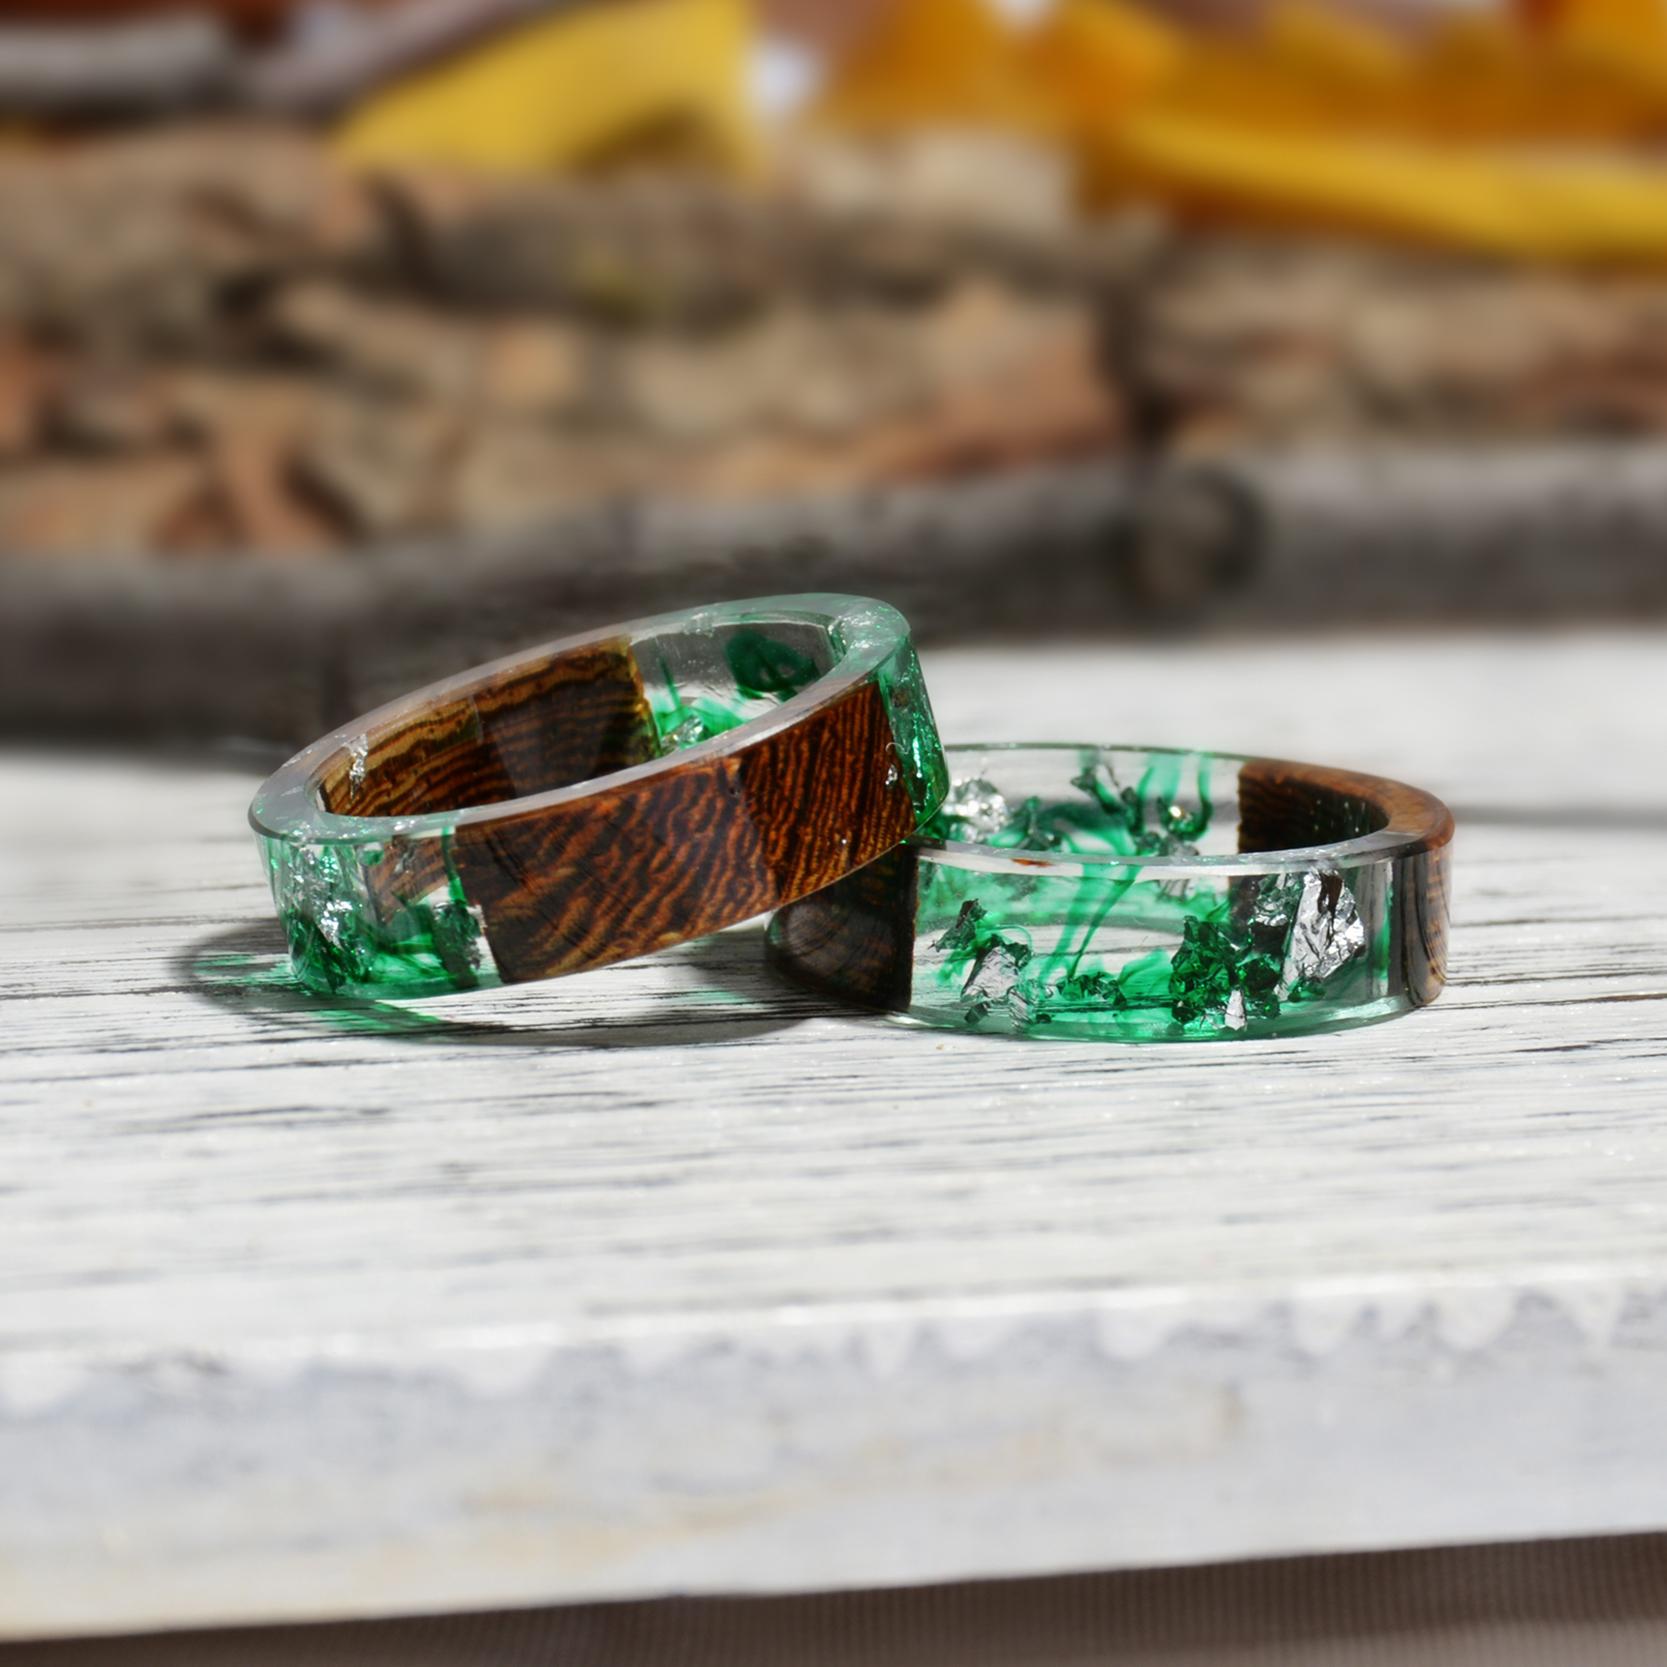 Clear Wood Resin Ring Handmade Dried Flower Hand Jewellery 20